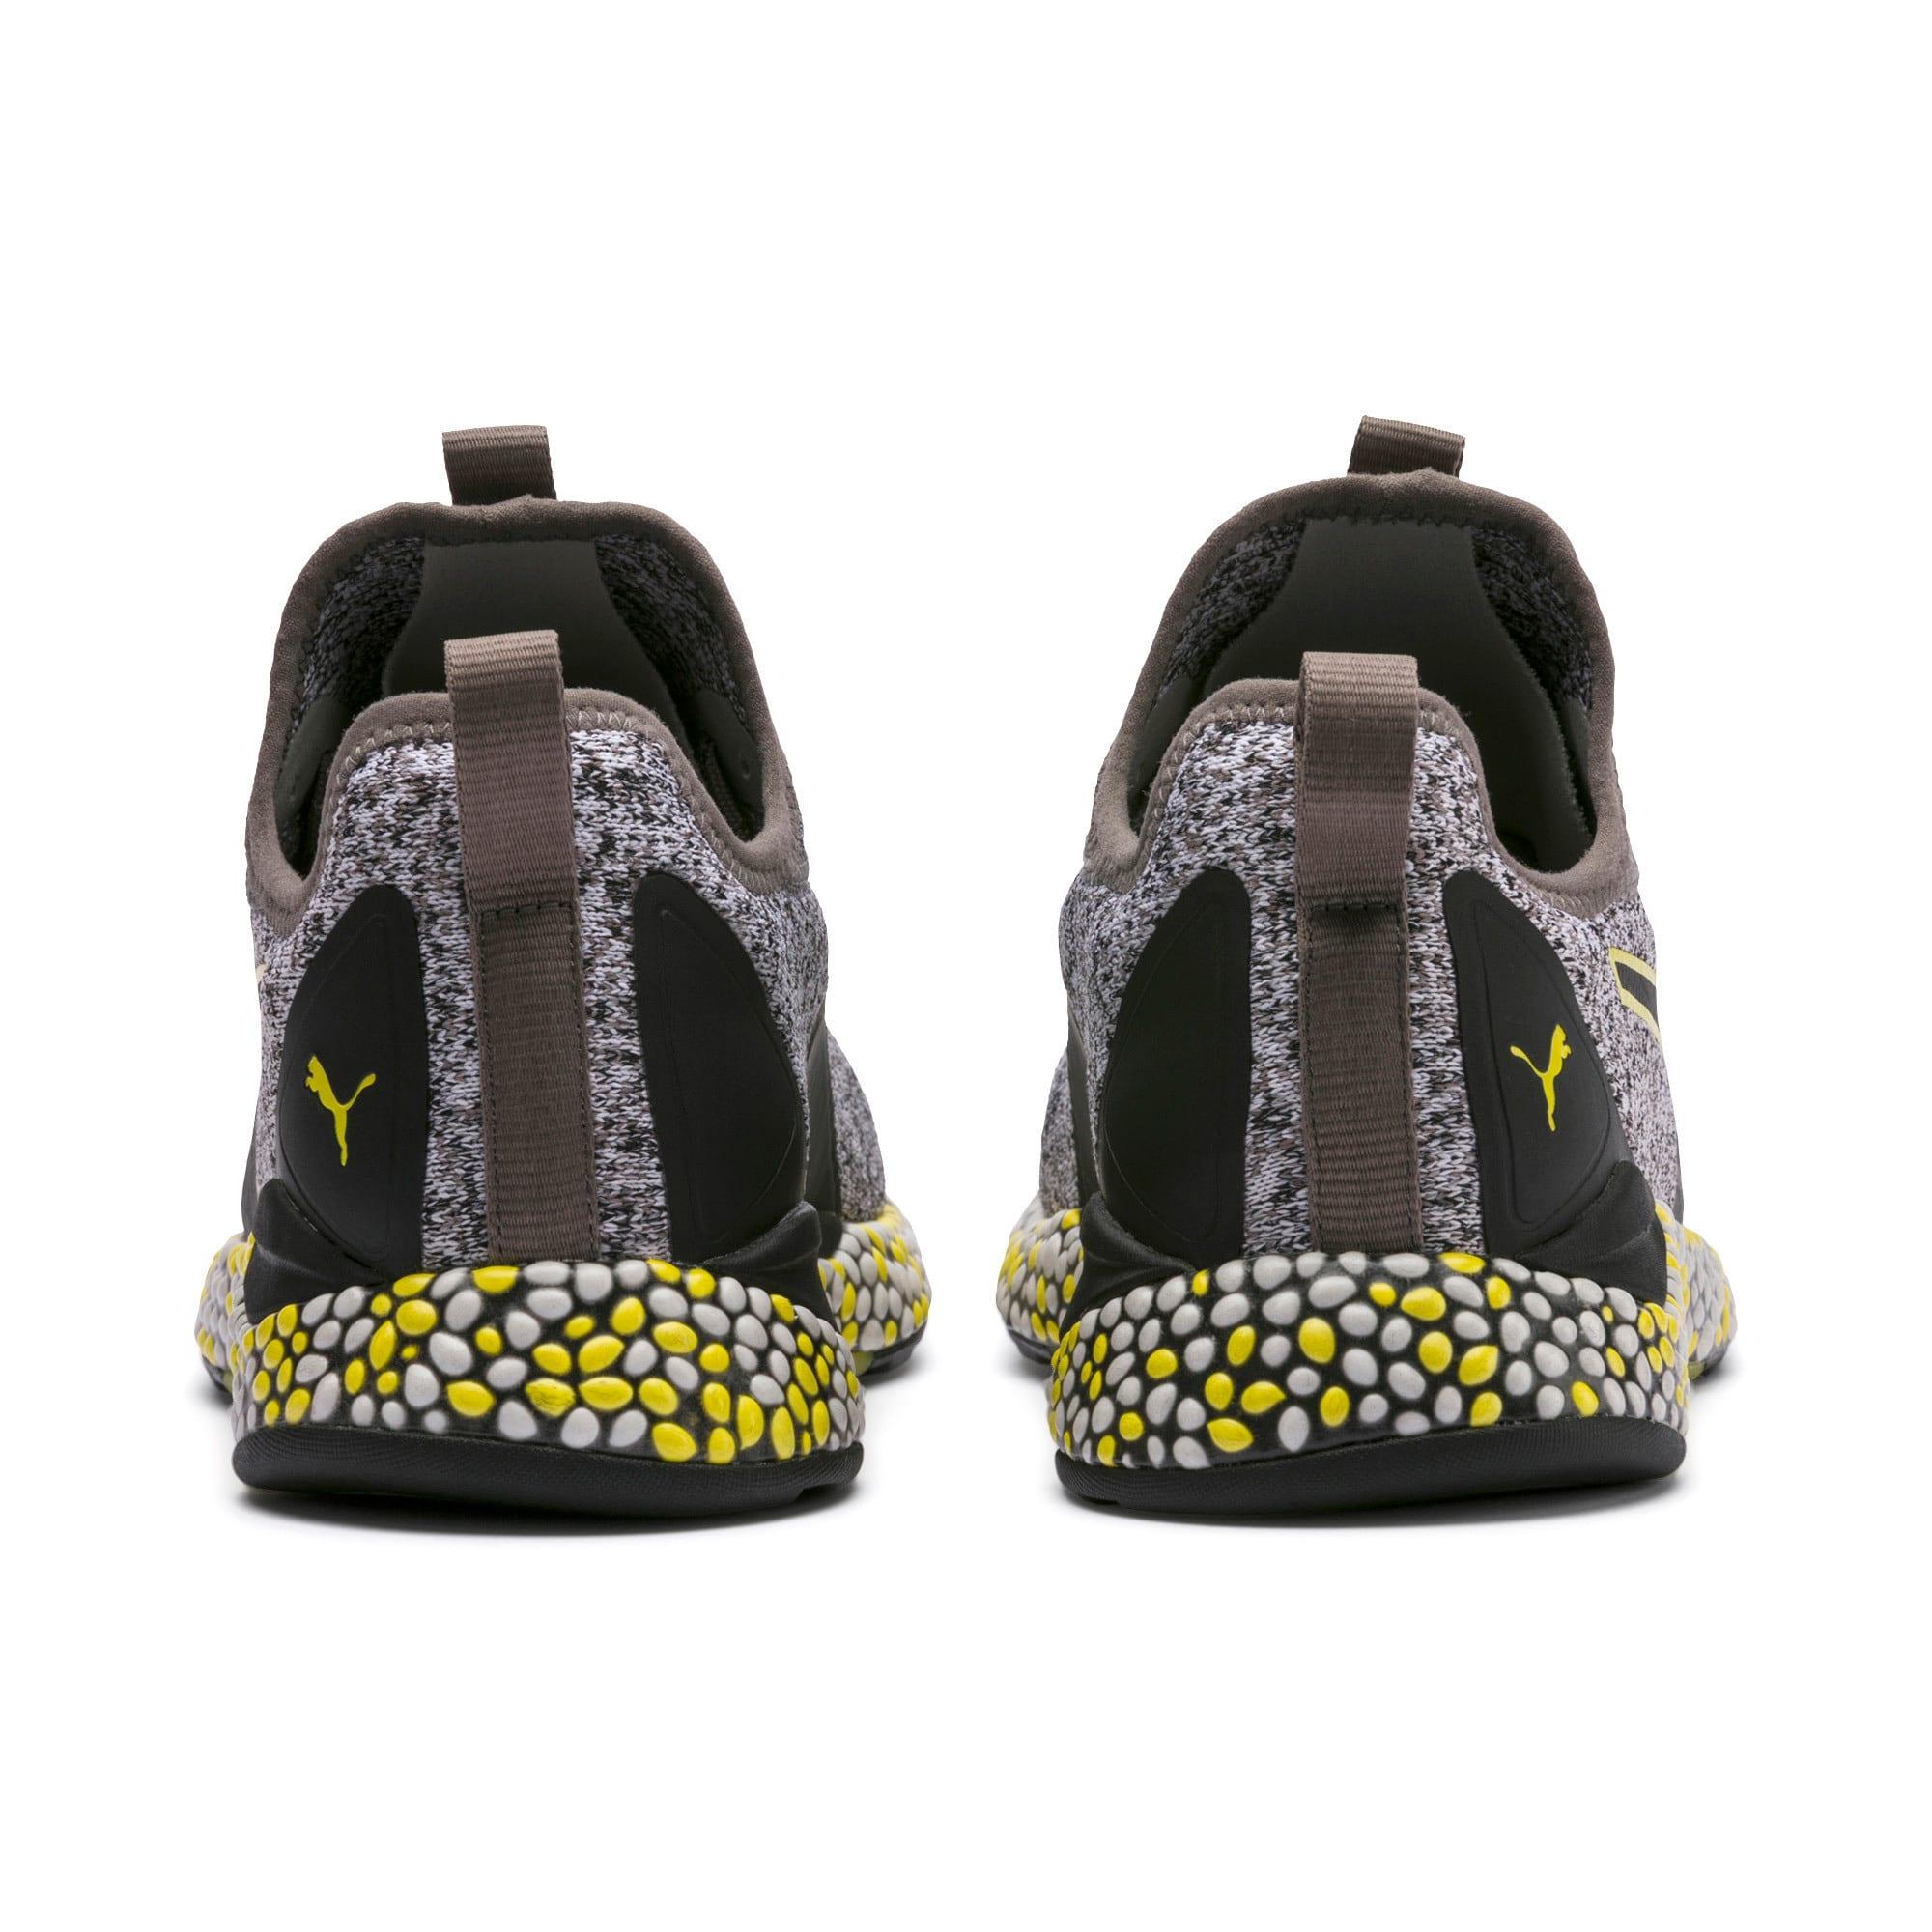 Thumbnail 3 of Hybrid Runner hardloopschoenen voor heren, Black-White-Blazing Yellow, medium